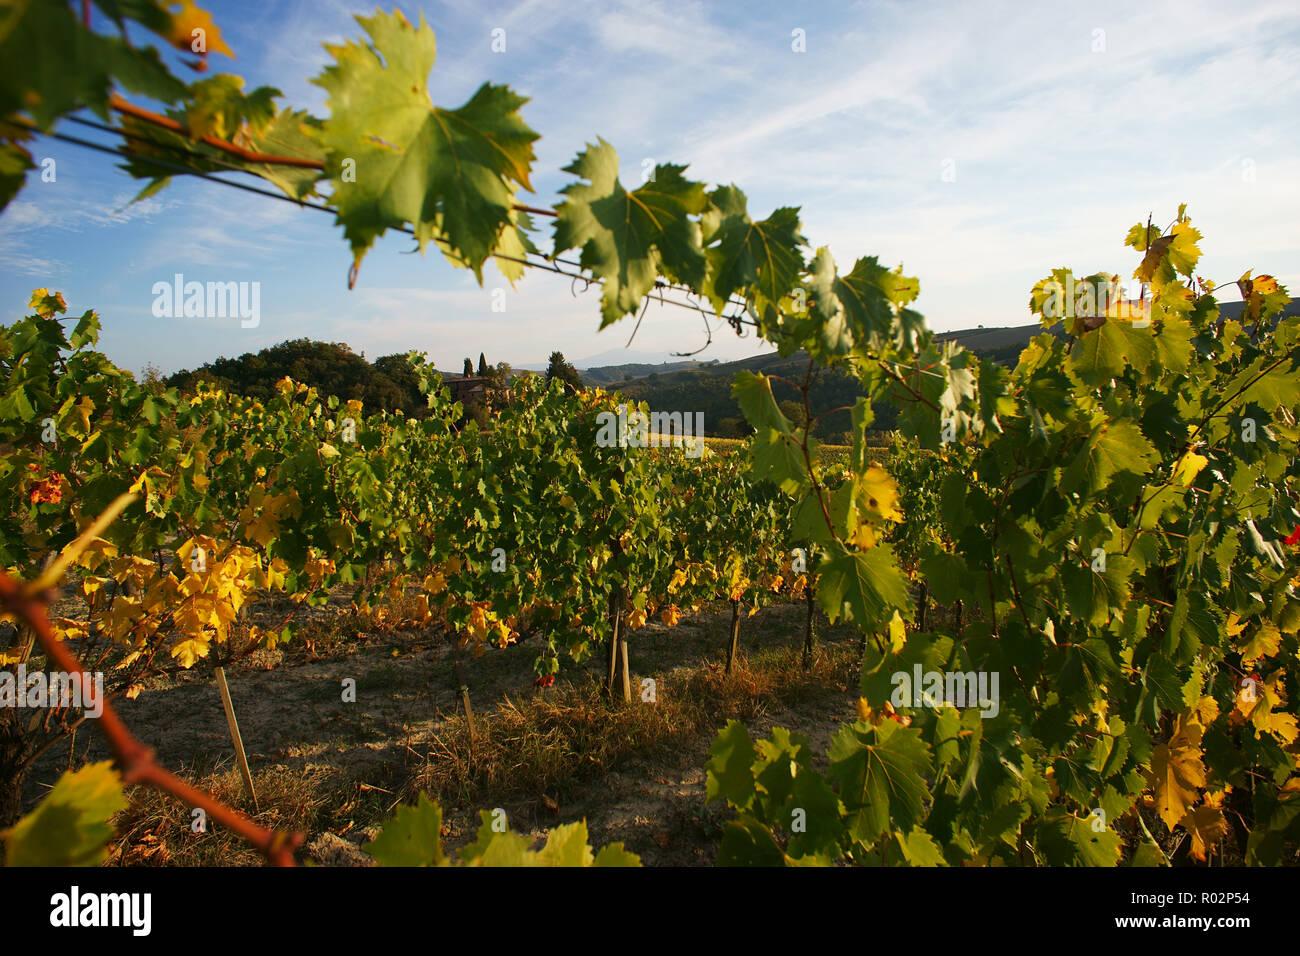 vineyard in Monterongriffoli, near Montalcino, province of